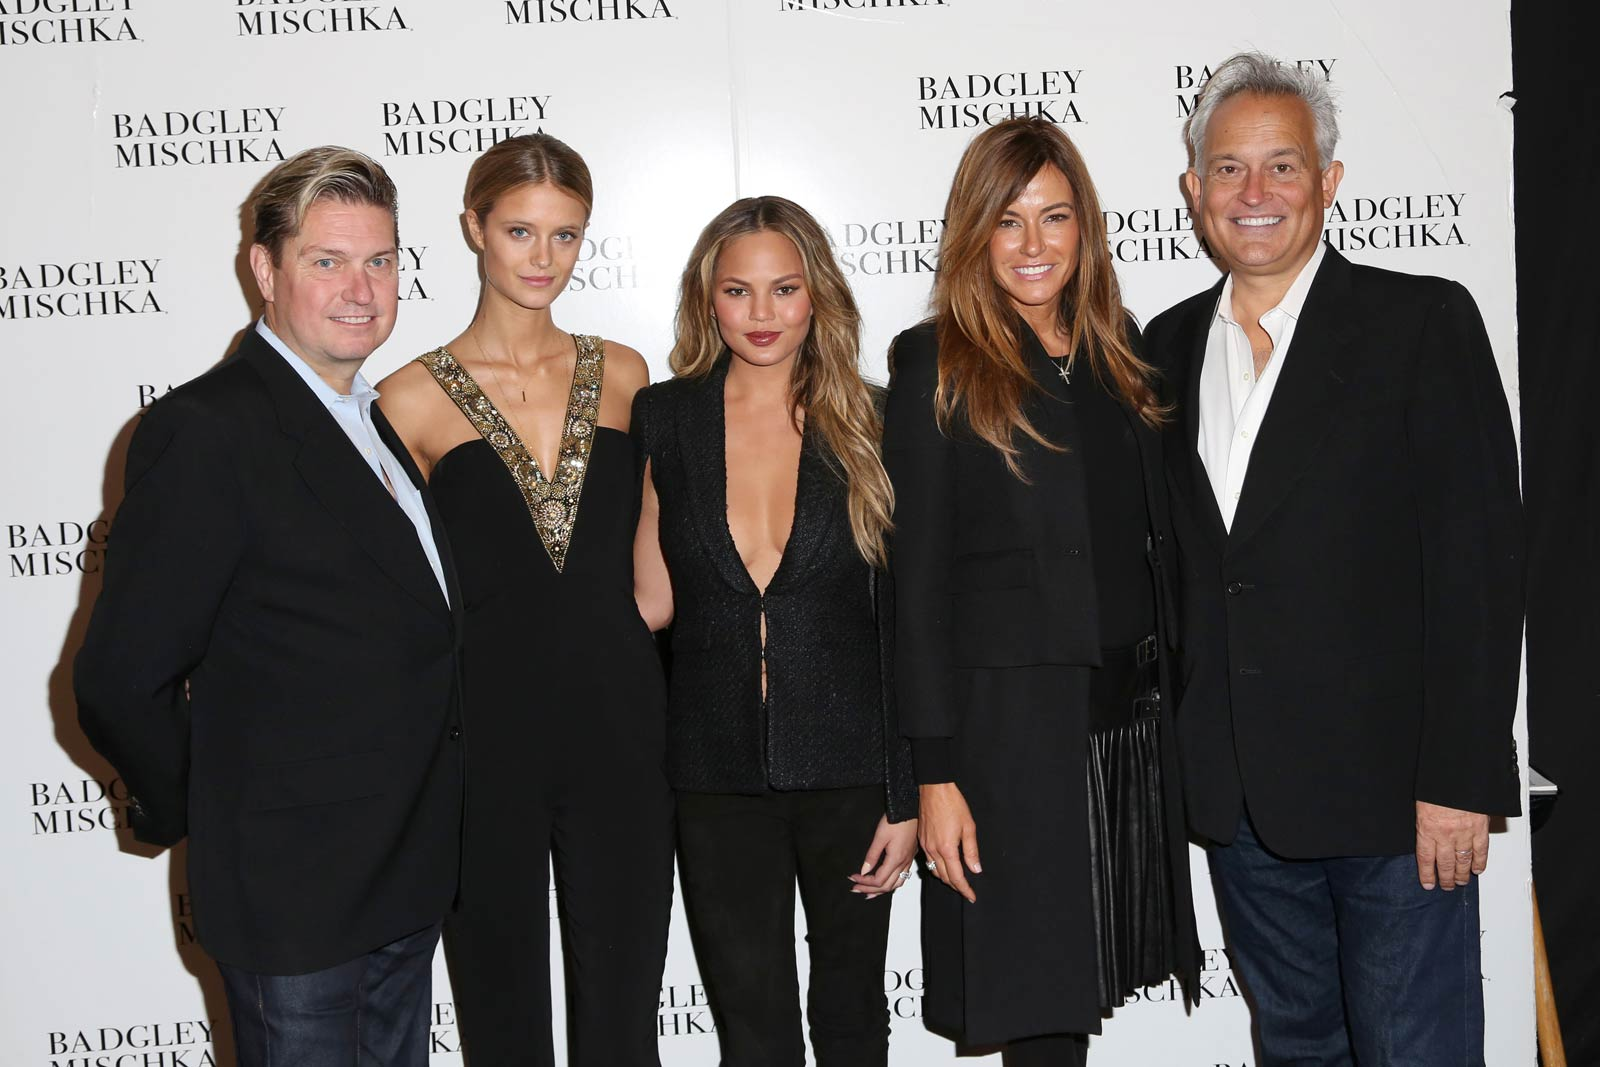 Kelly Killoren Bensimon attends Badgley Mischka show